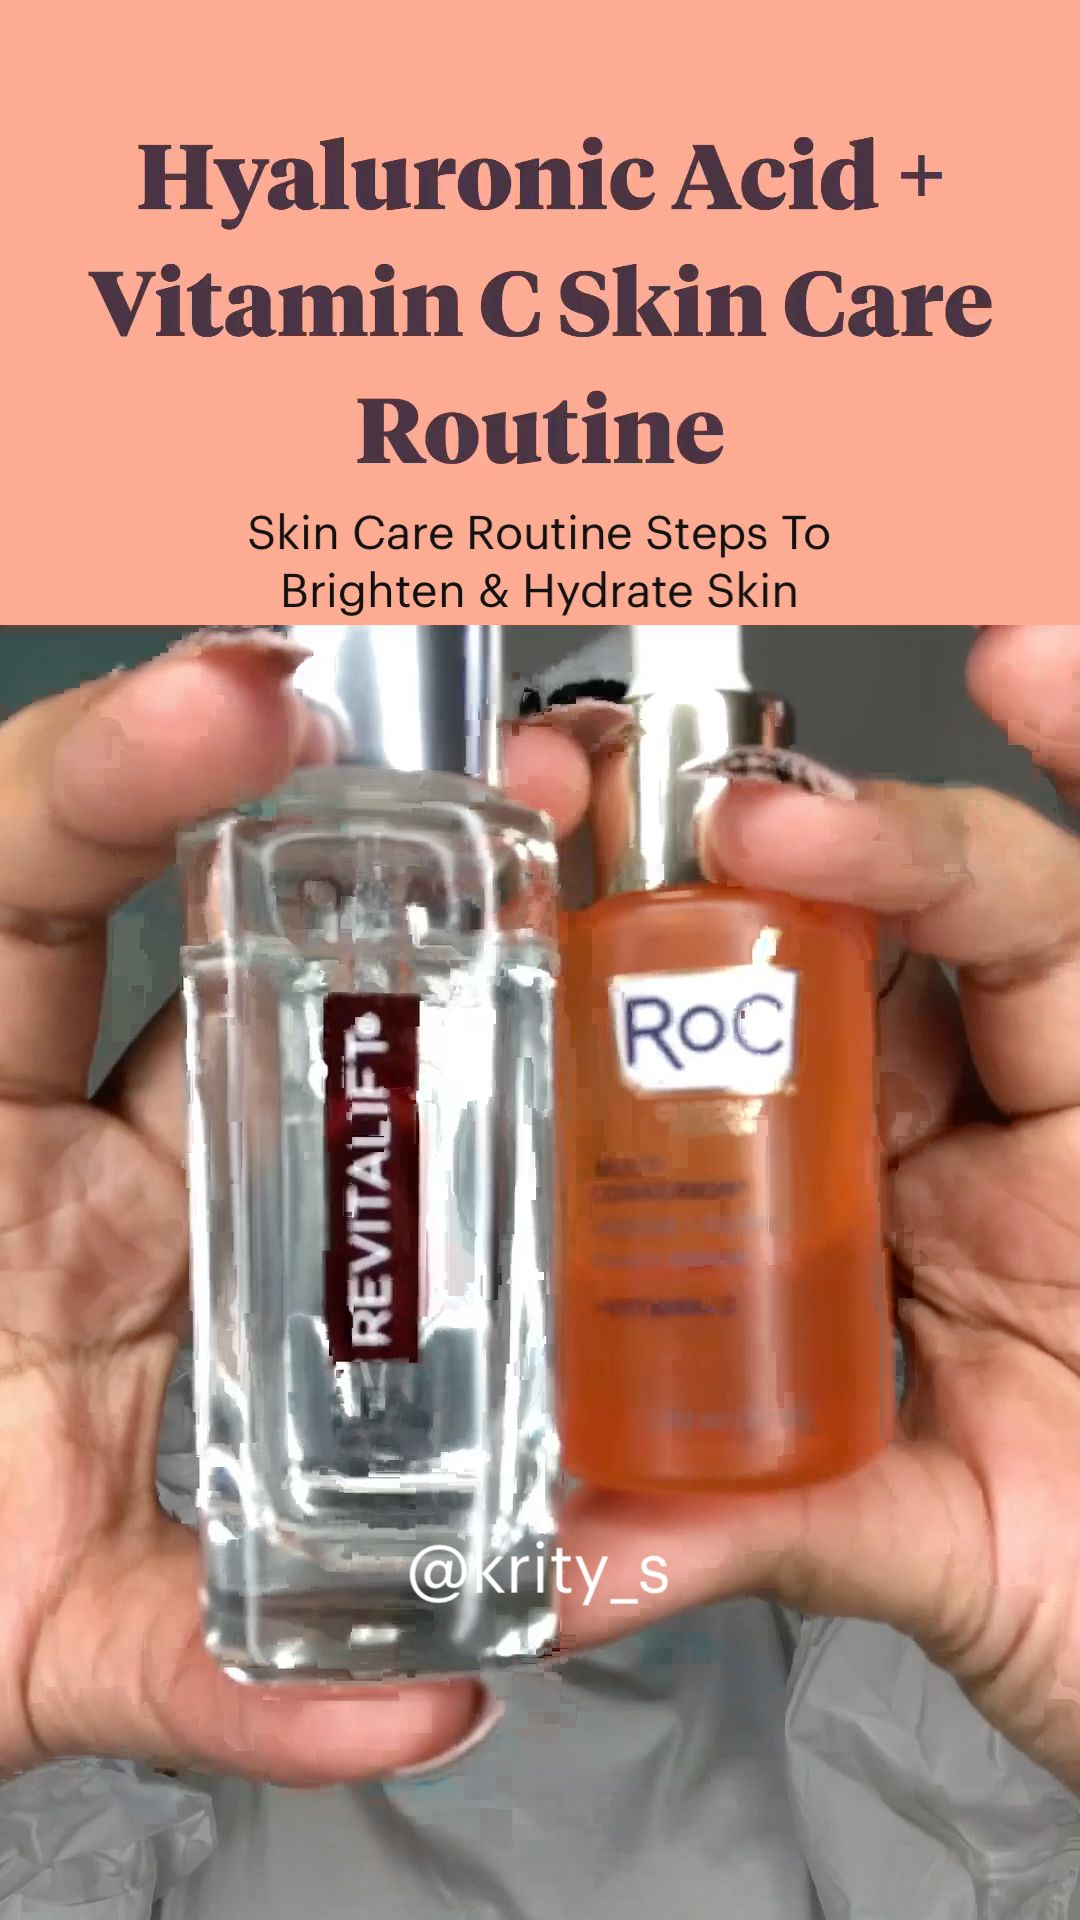 Skin Care Routine Steps To Brighten & Hydrate Skin